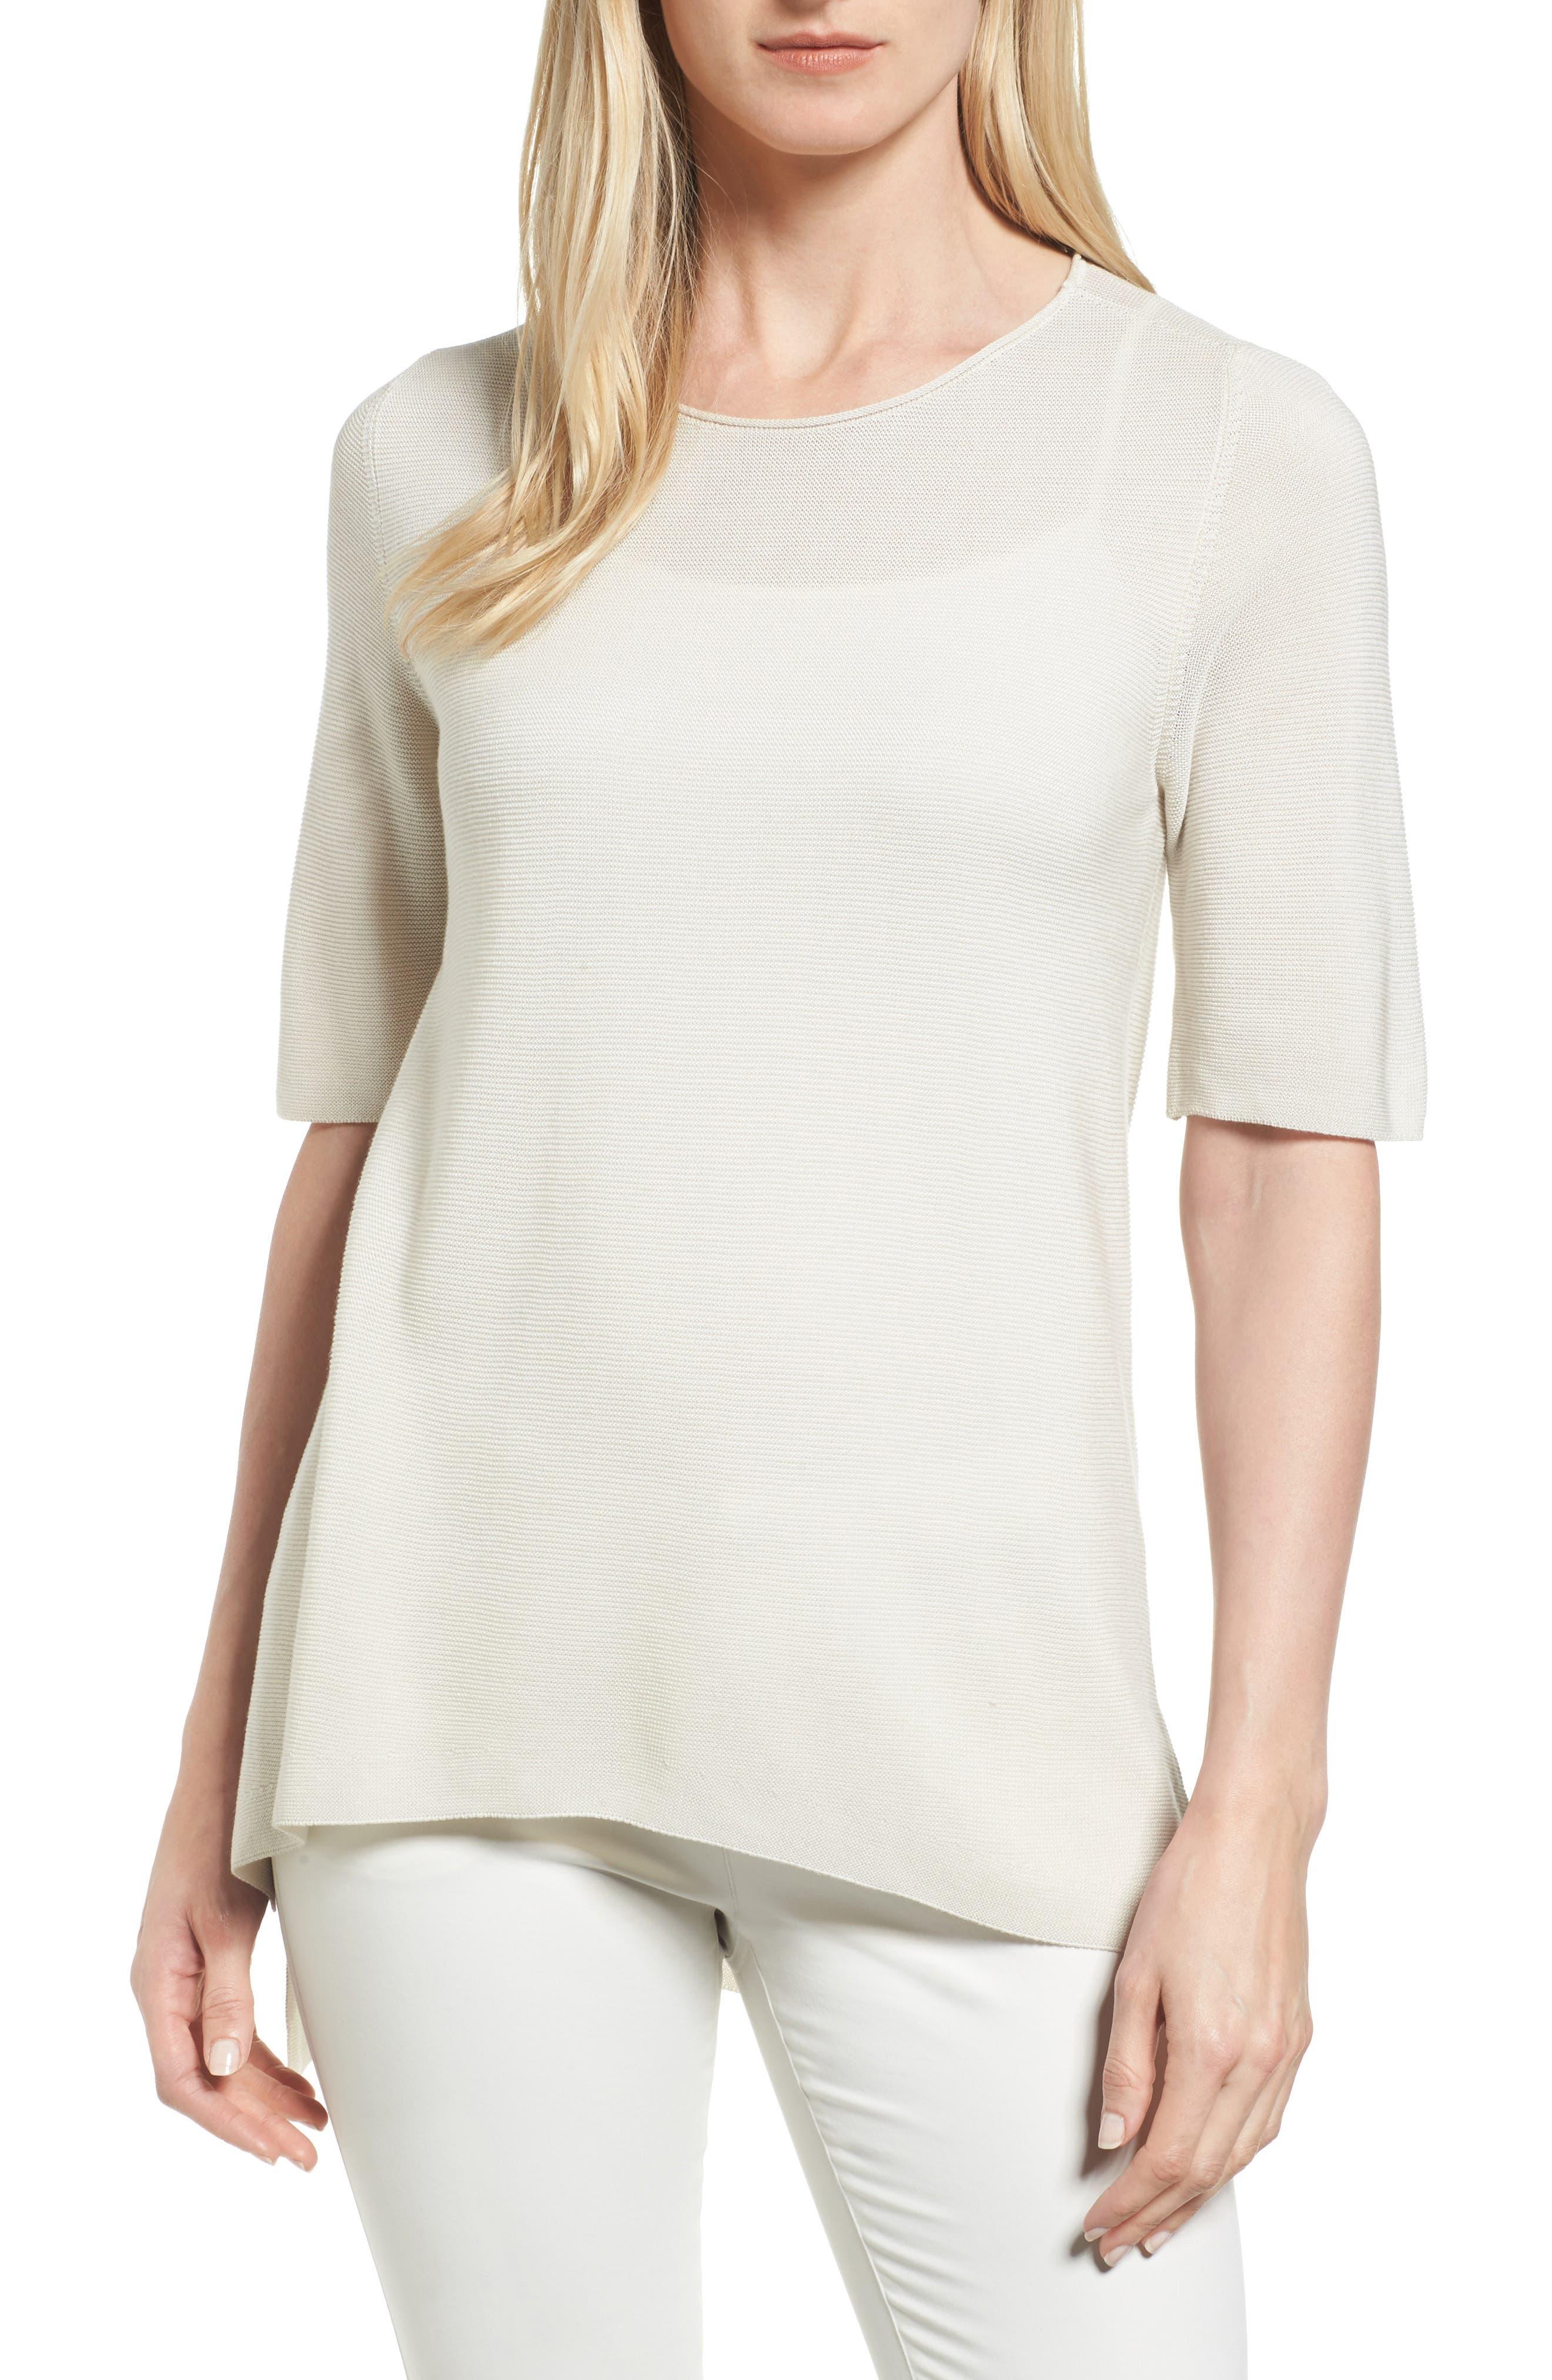 Main Image - Eileen Fisher Tencel® Knit Top (Regular & Petite)